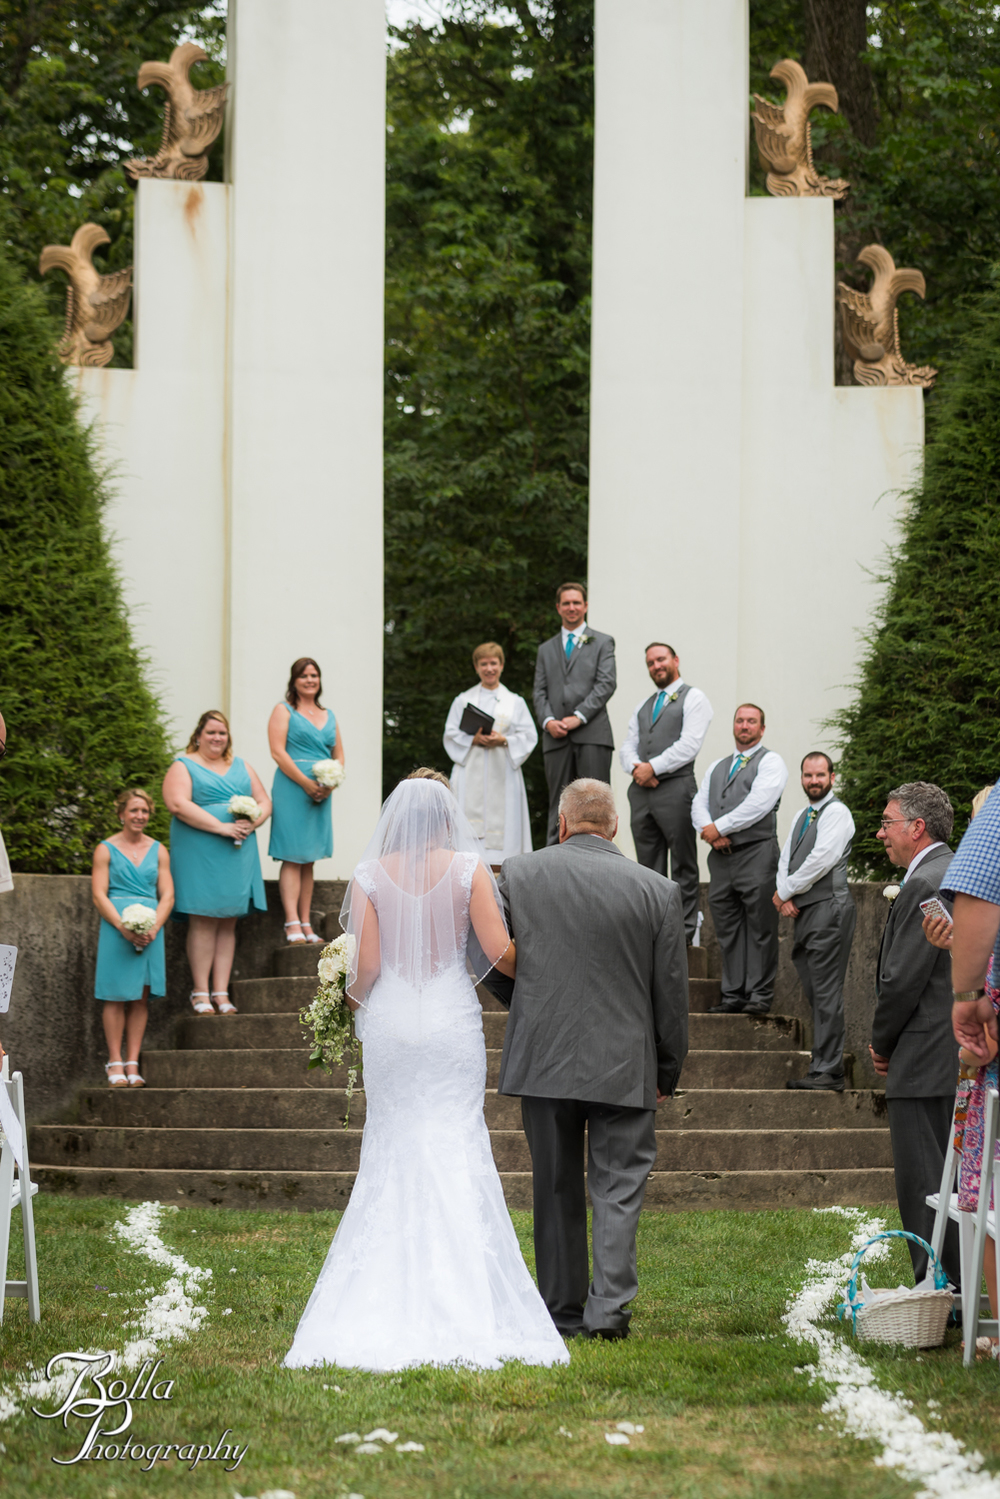 Bolla_Photography_St_Louis_wedding_photographer-0231.jpg